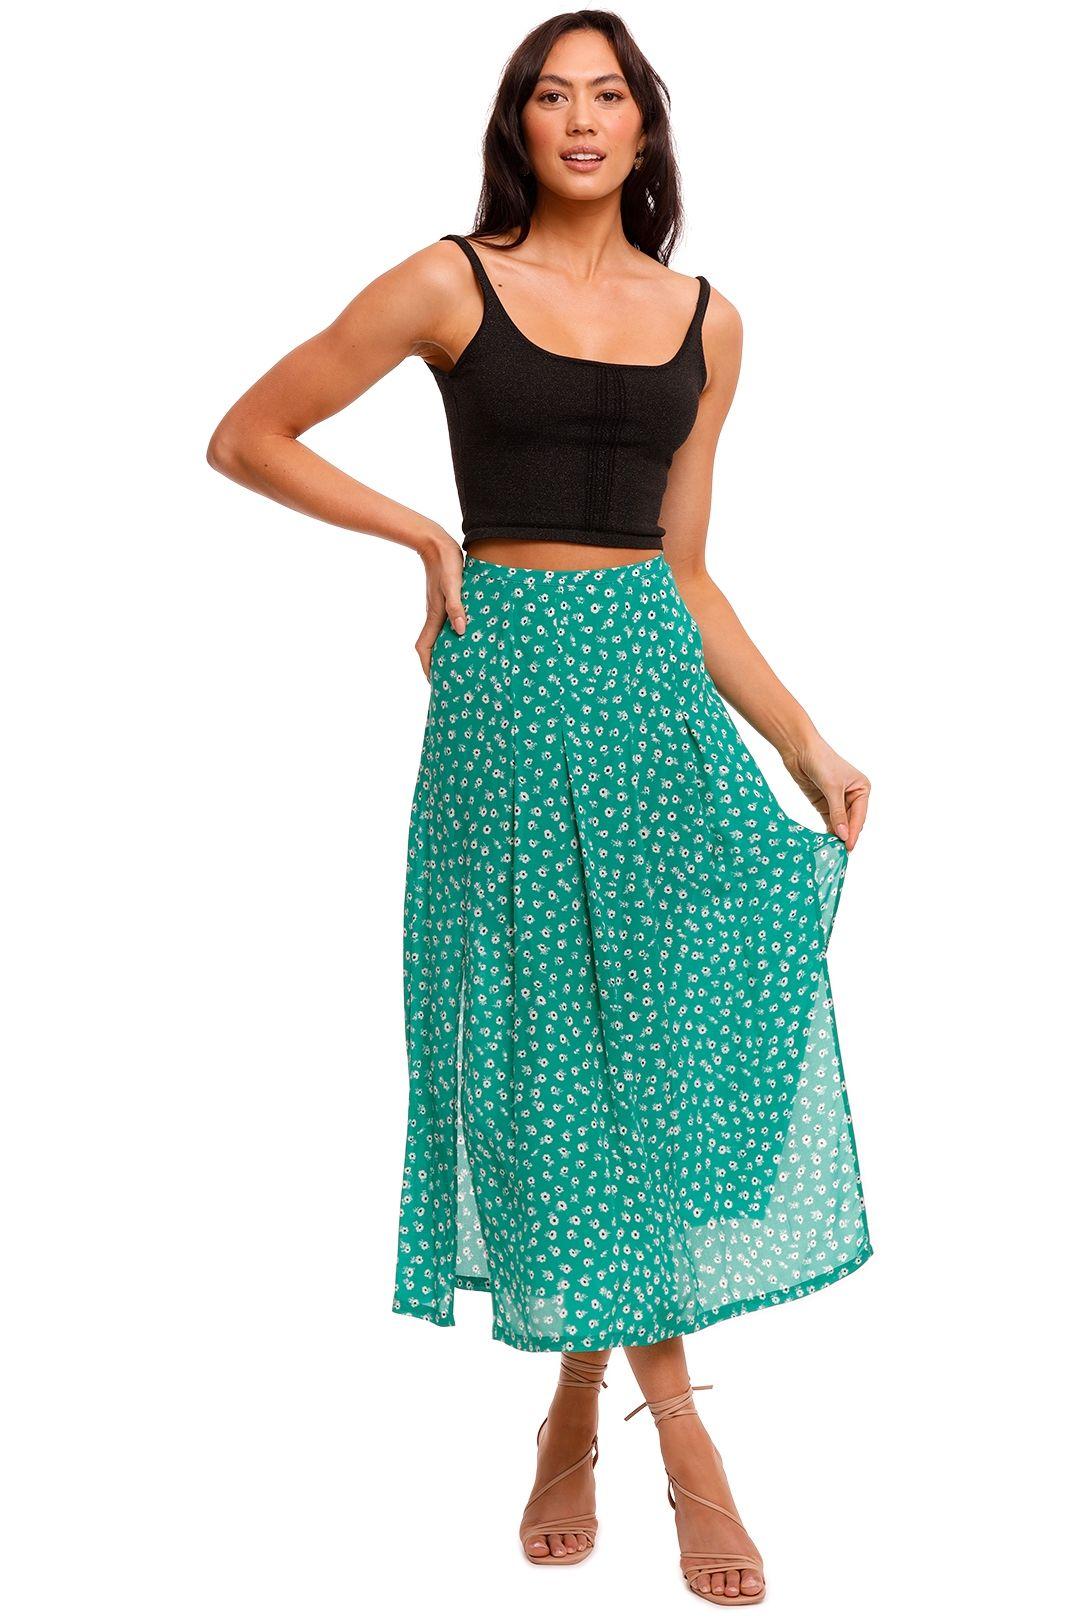 Rixo London Georgia Midi Skirt With Front Slits